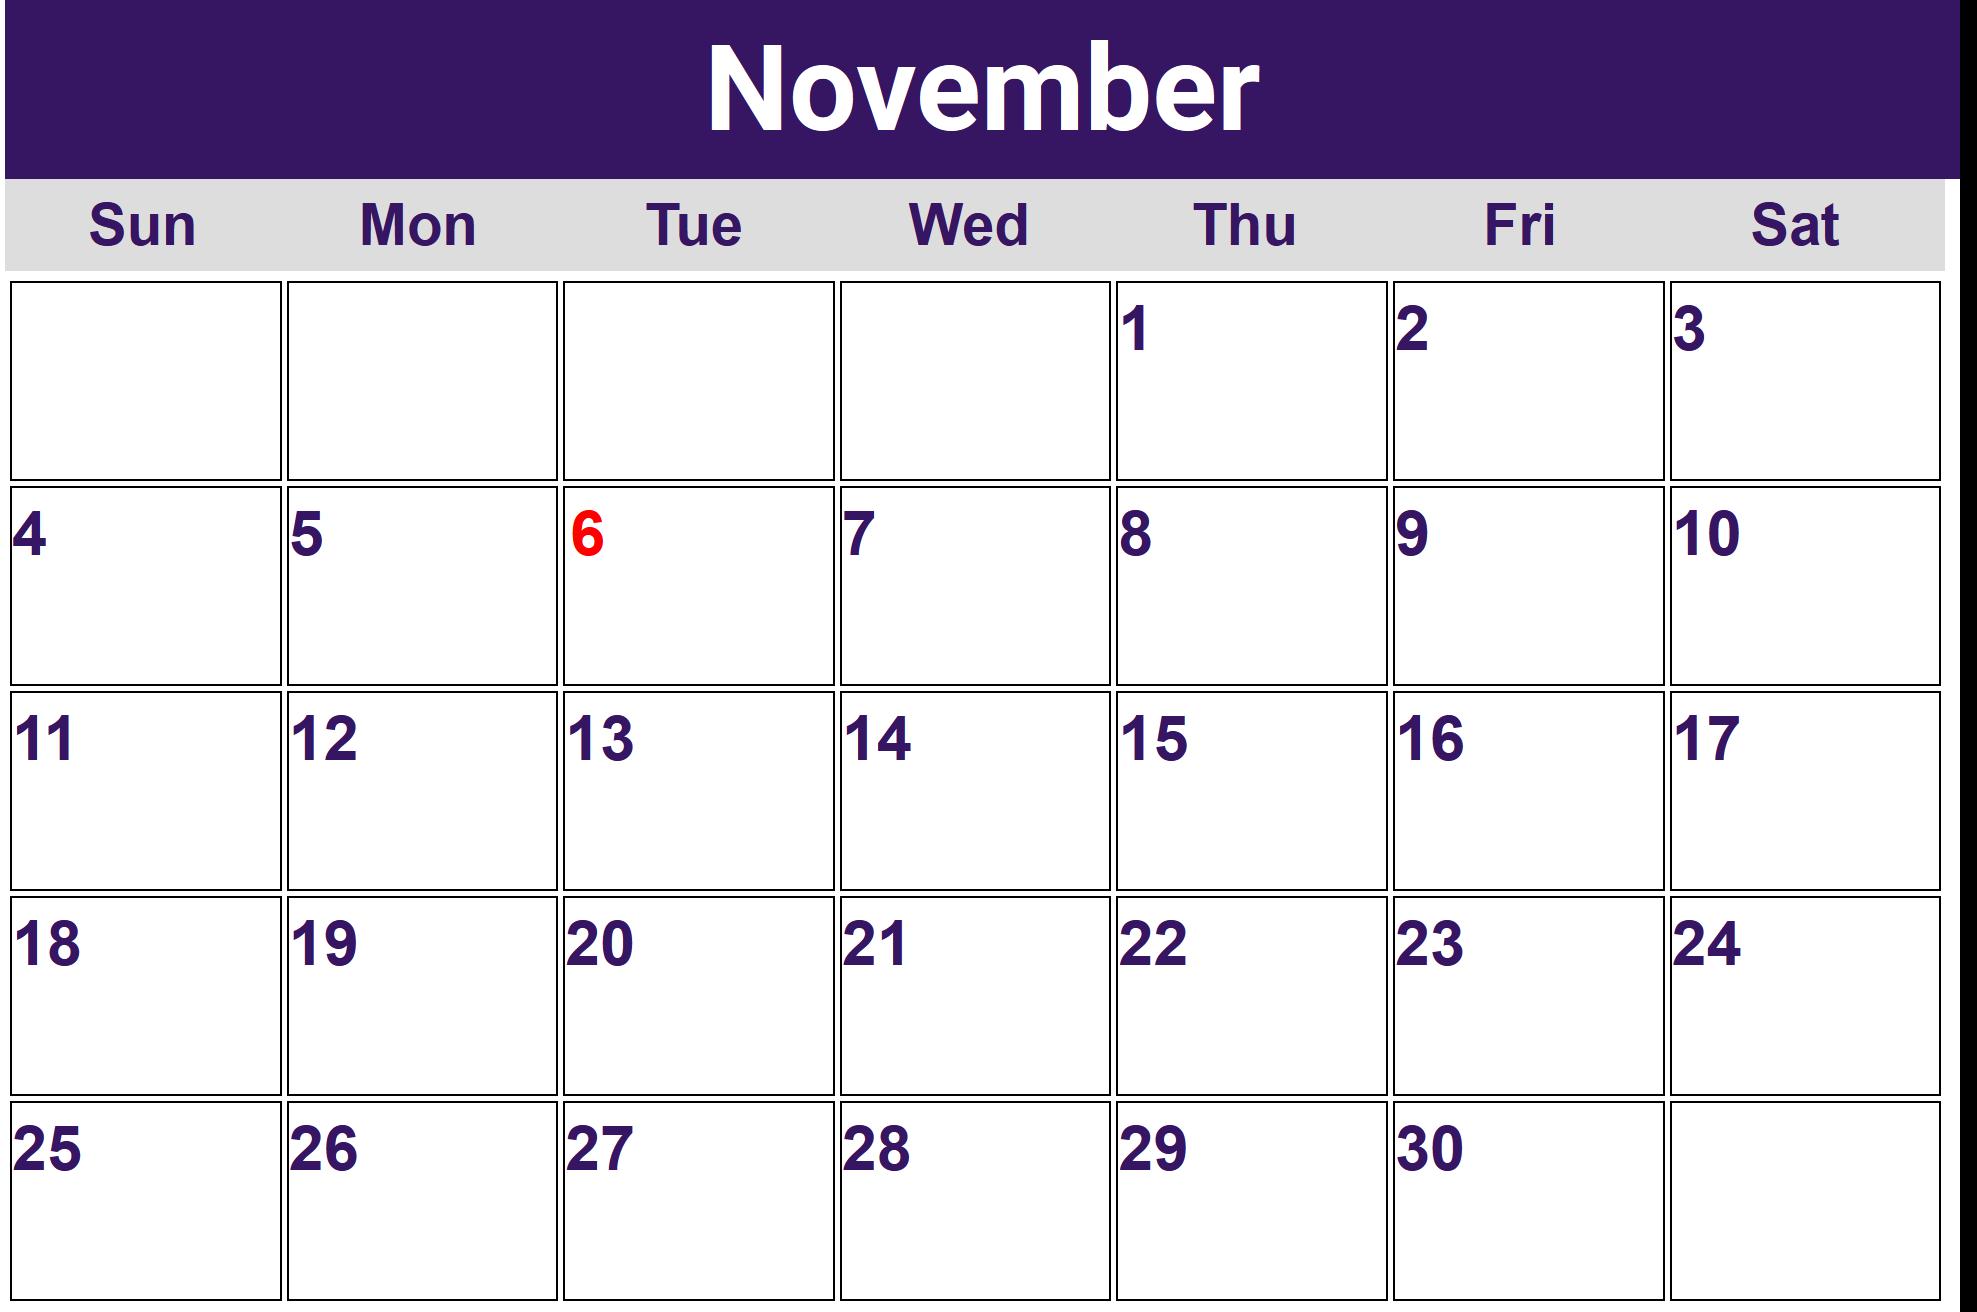 November 2018 Calendar Template Free